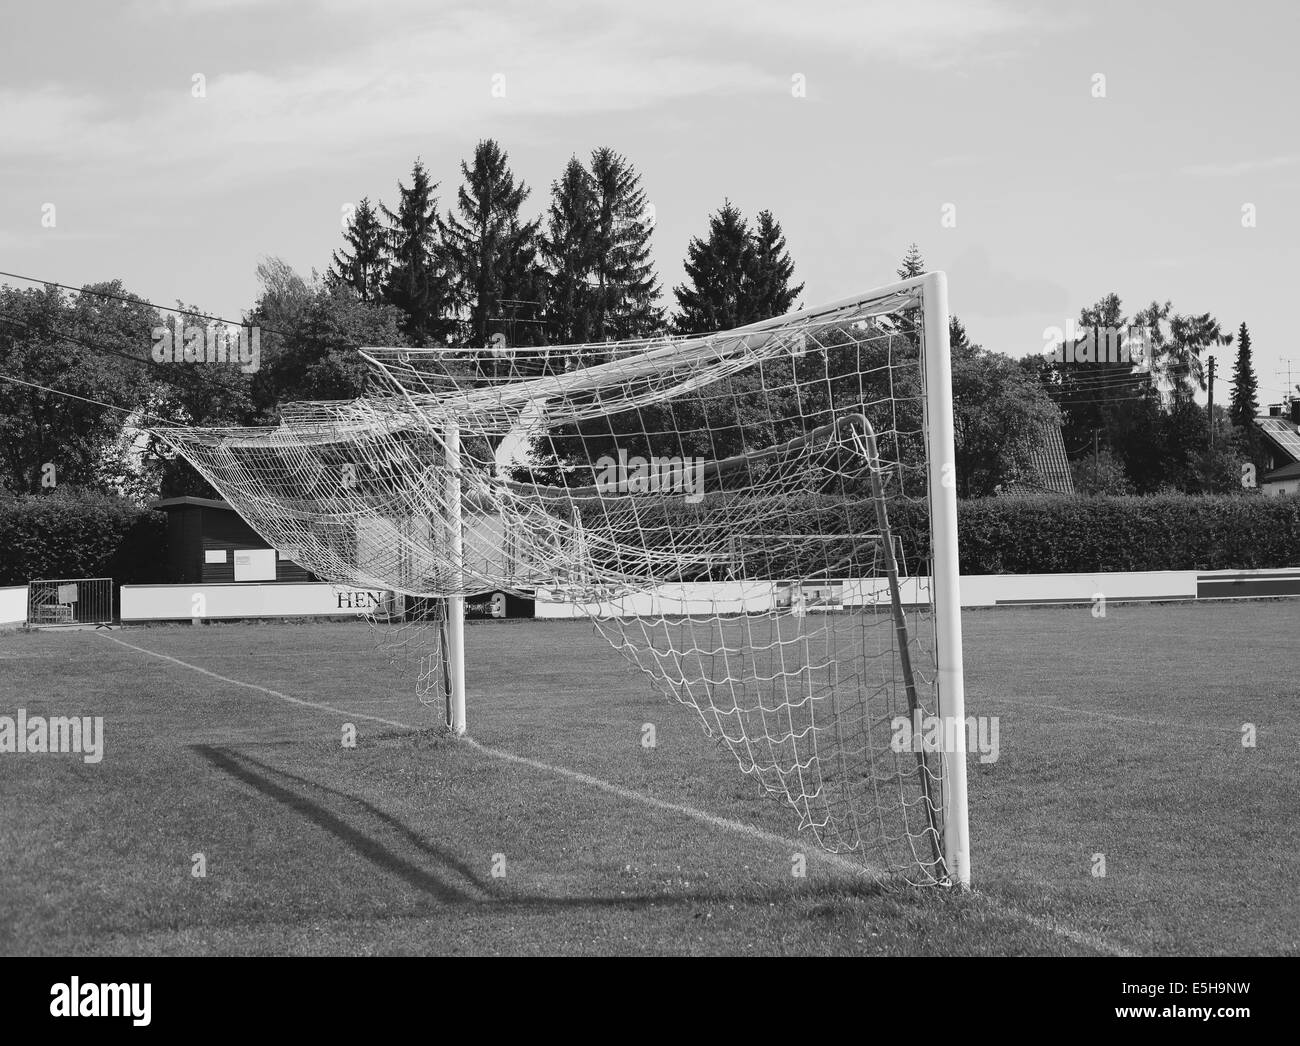 Football gate - Stock Image